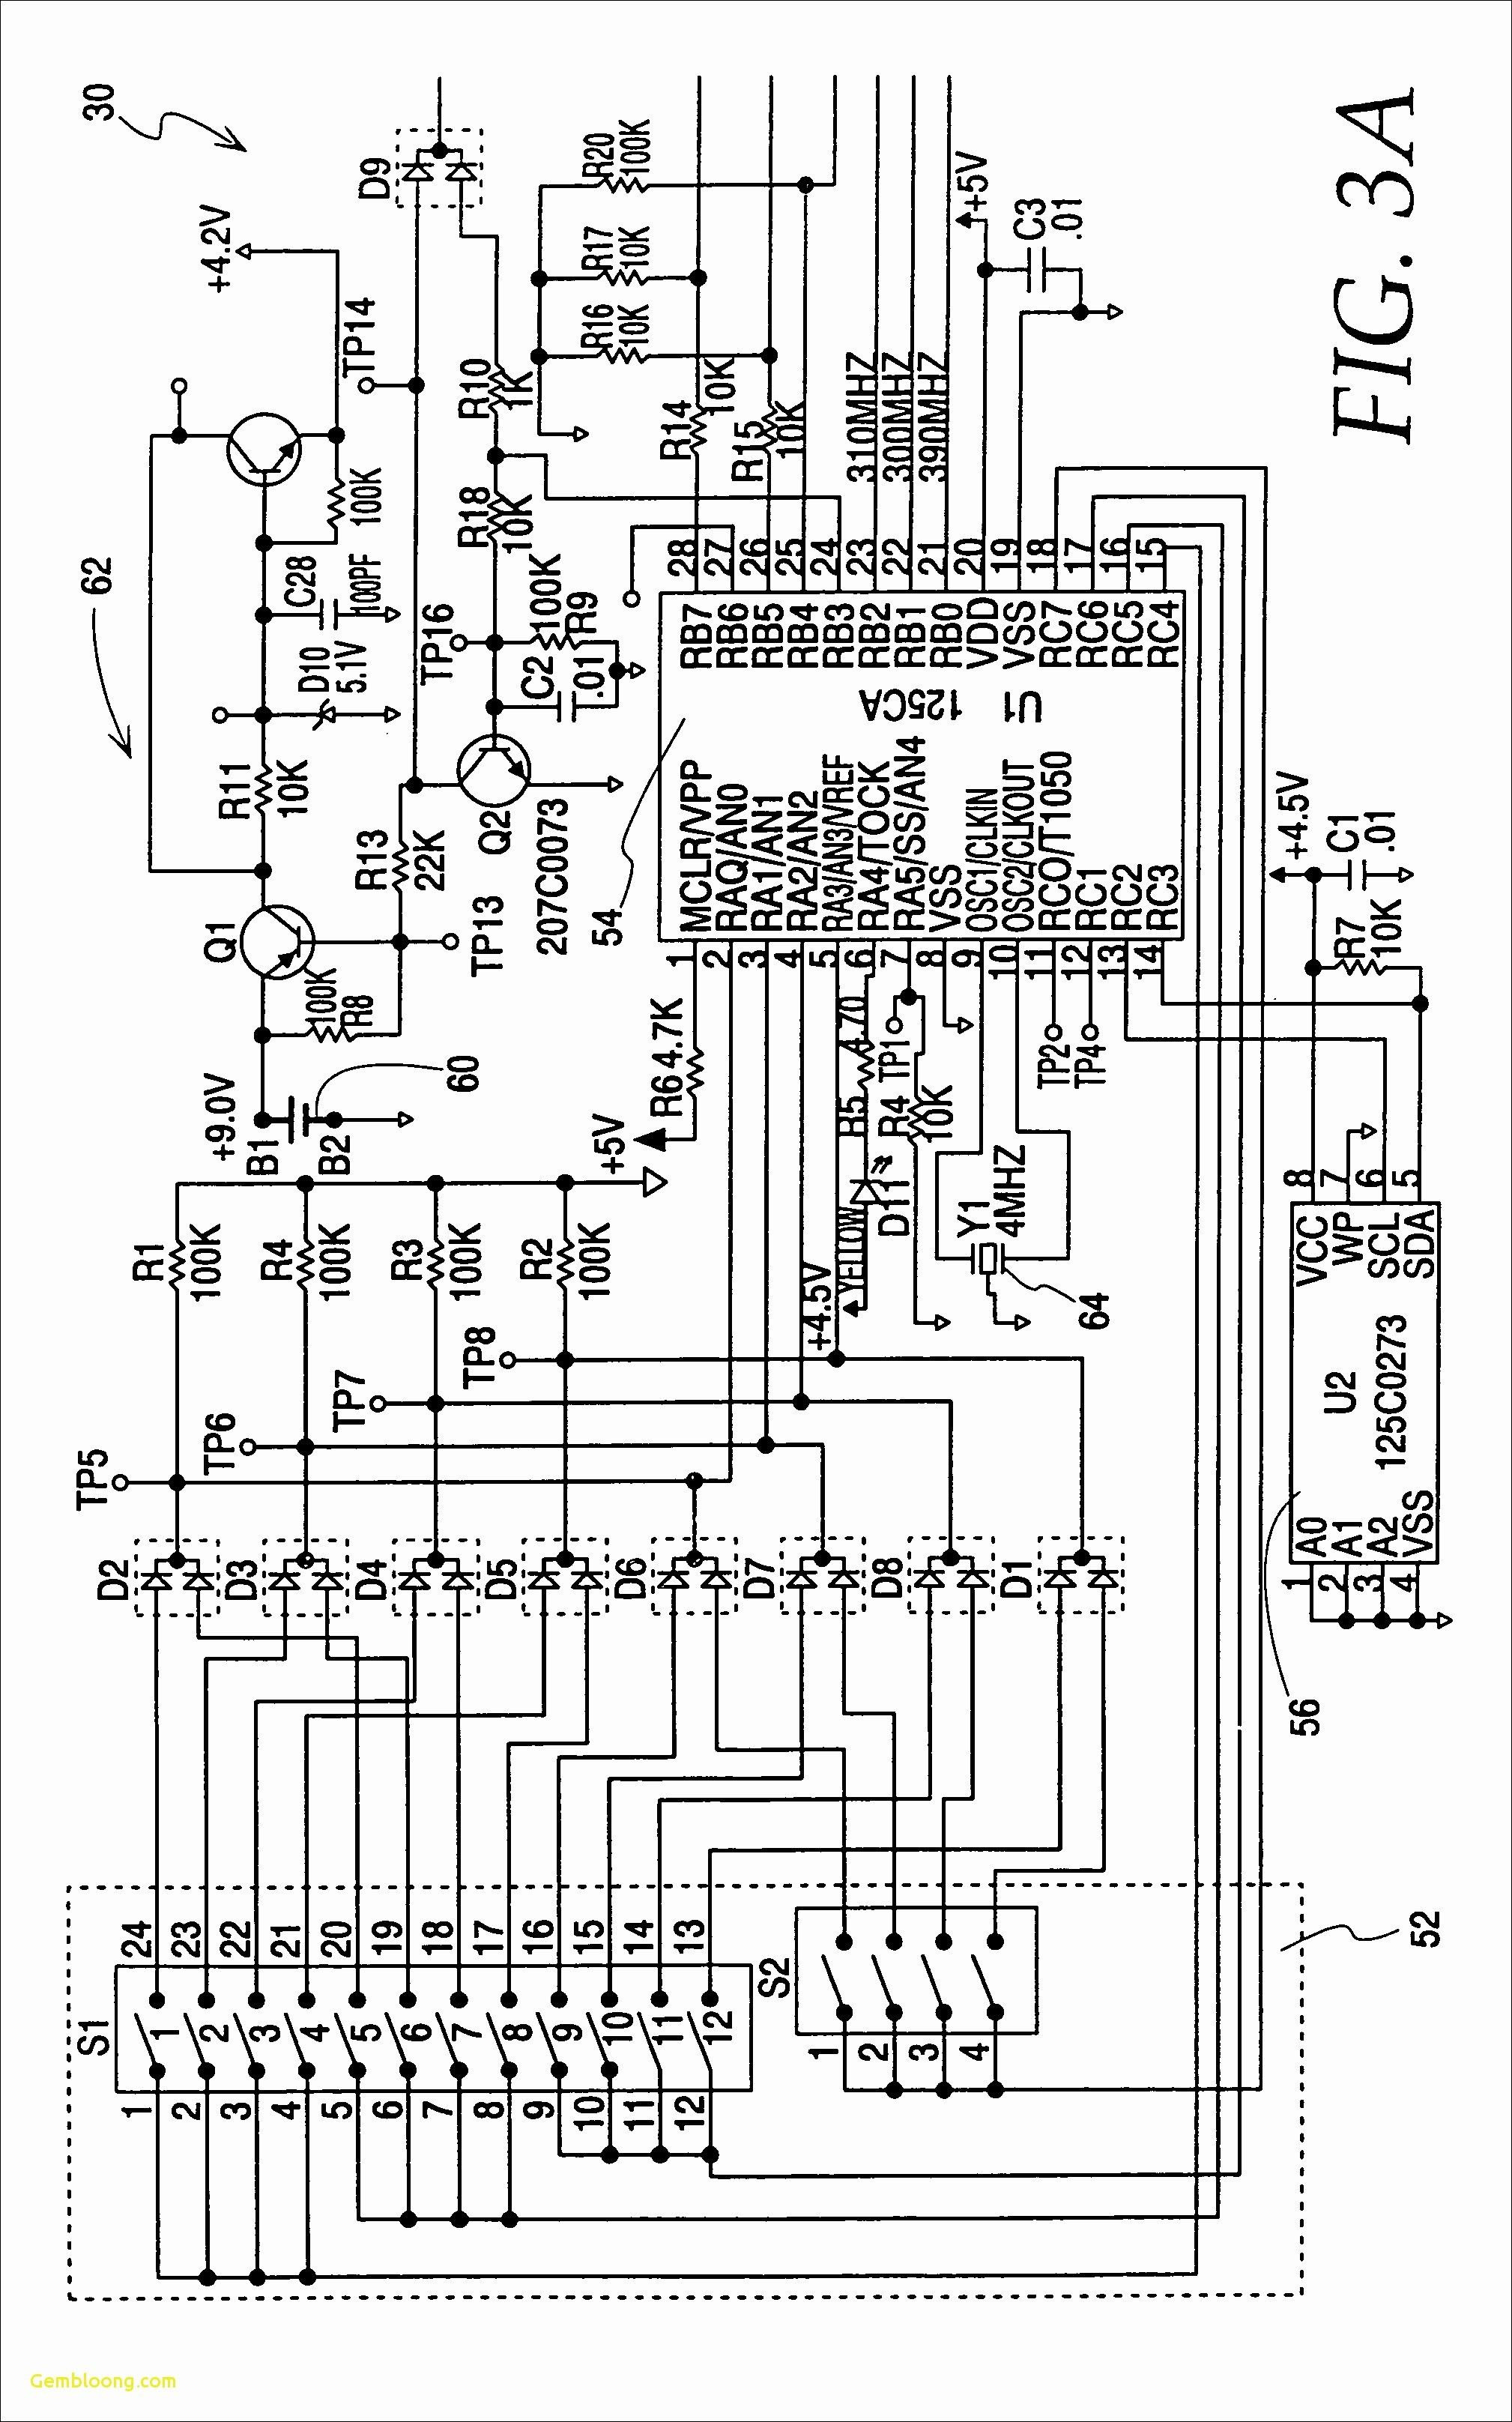 Unique Wiring Diagram for Mk Garage Kit #diagram #